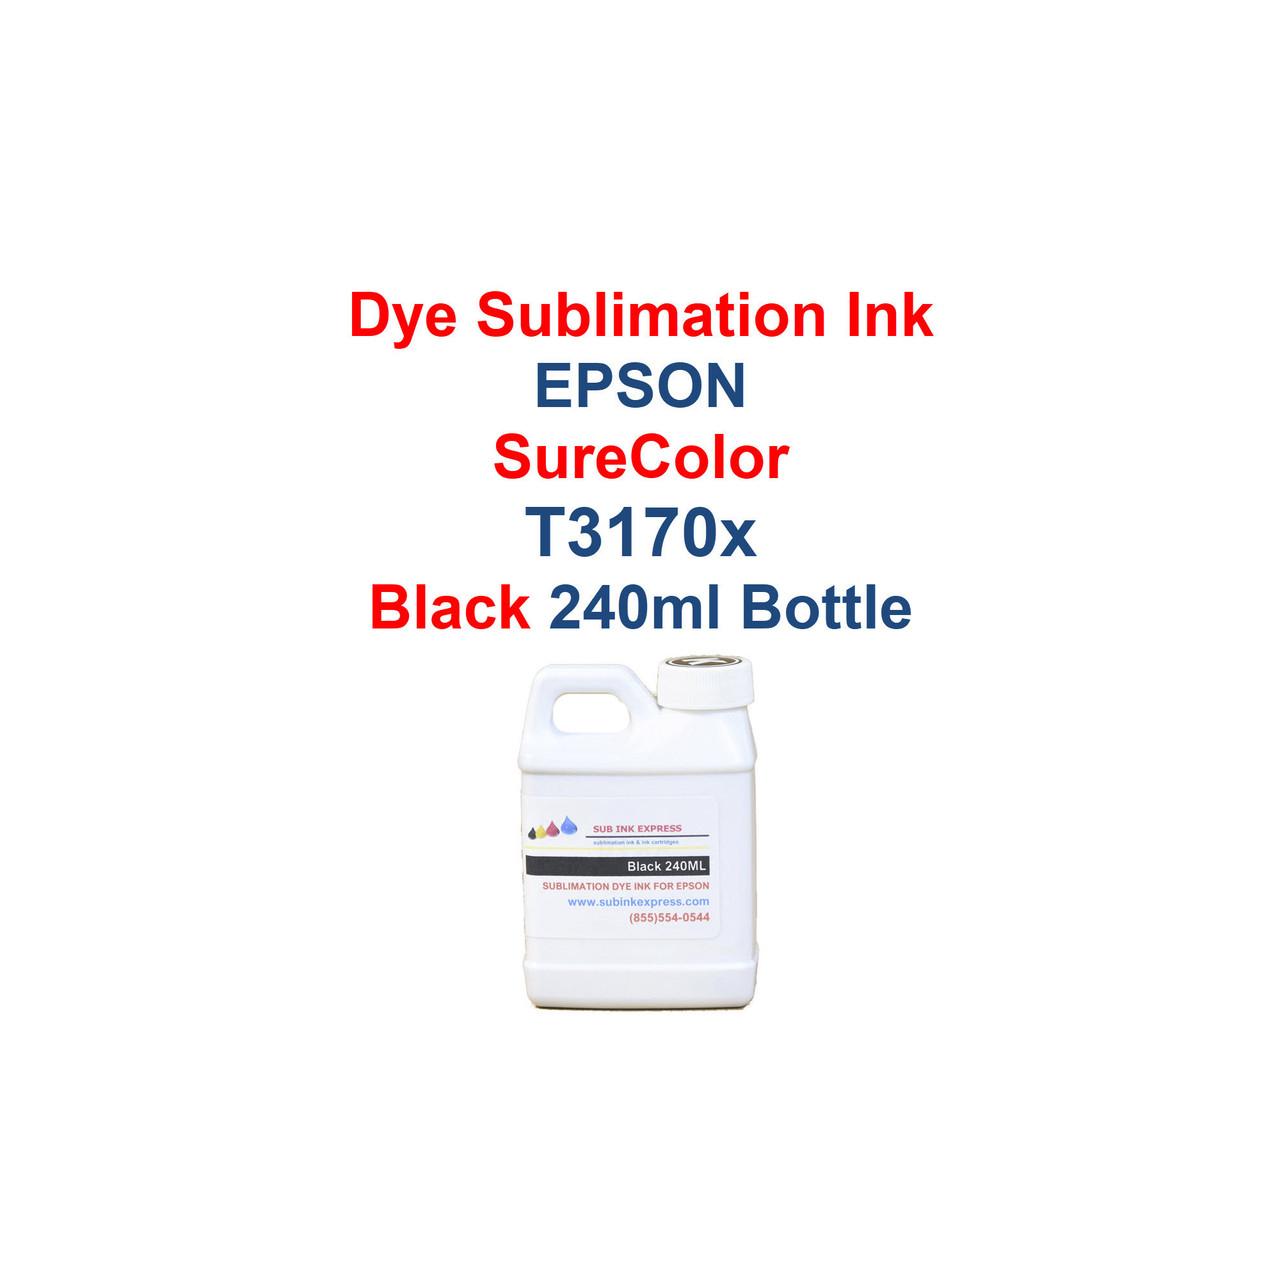 Dye Sublimation ink 4- 240ml bottles for Epson SureColor T3170x printers